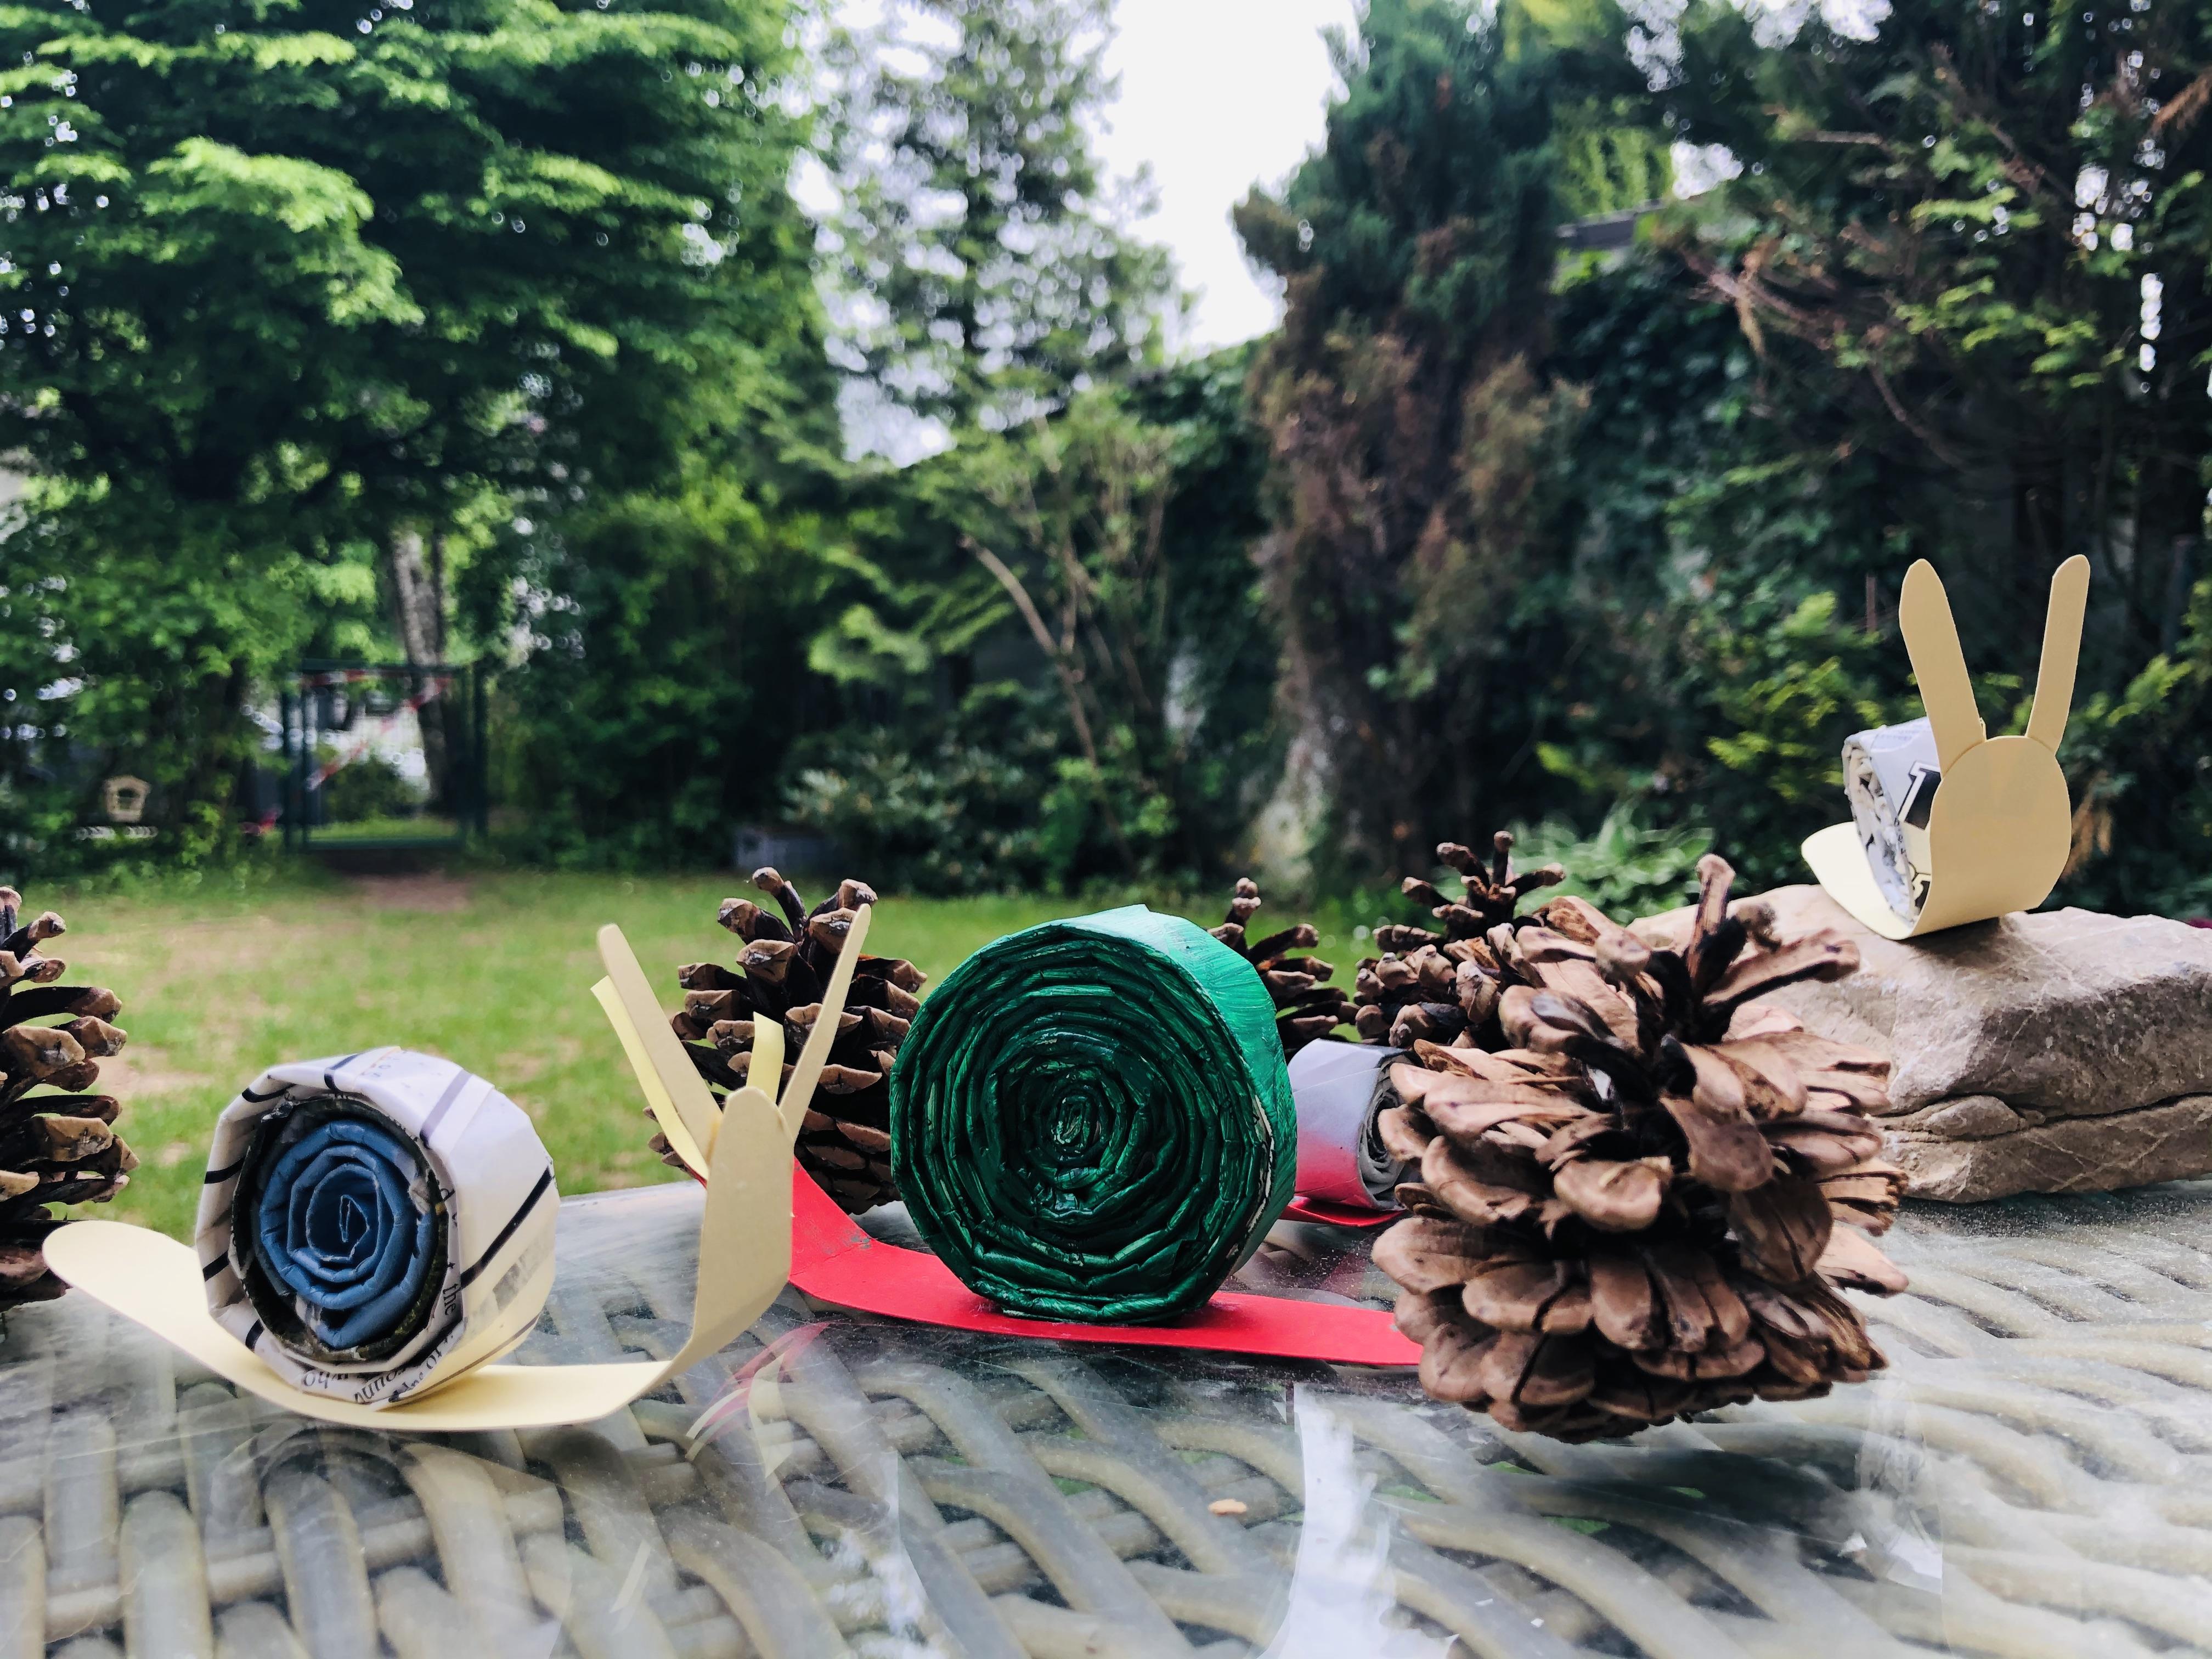 final DIY snail toys